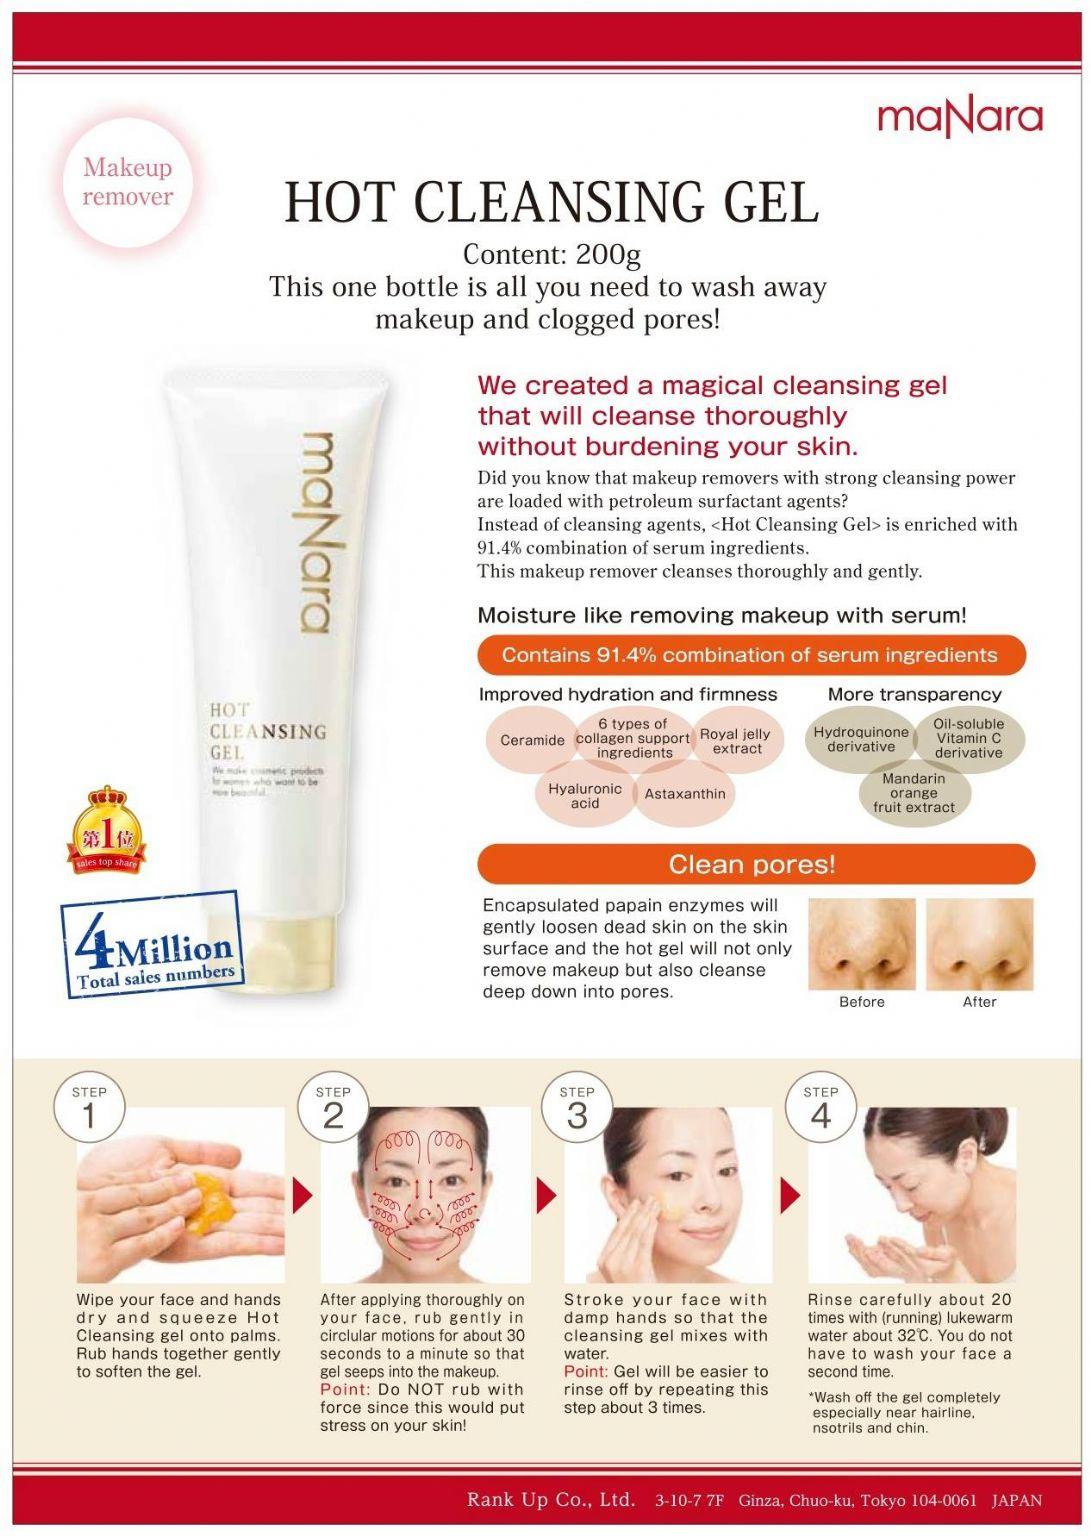 maNara - Hot Cleansing Gel reviews, photos, ingredients - MakeupAlley